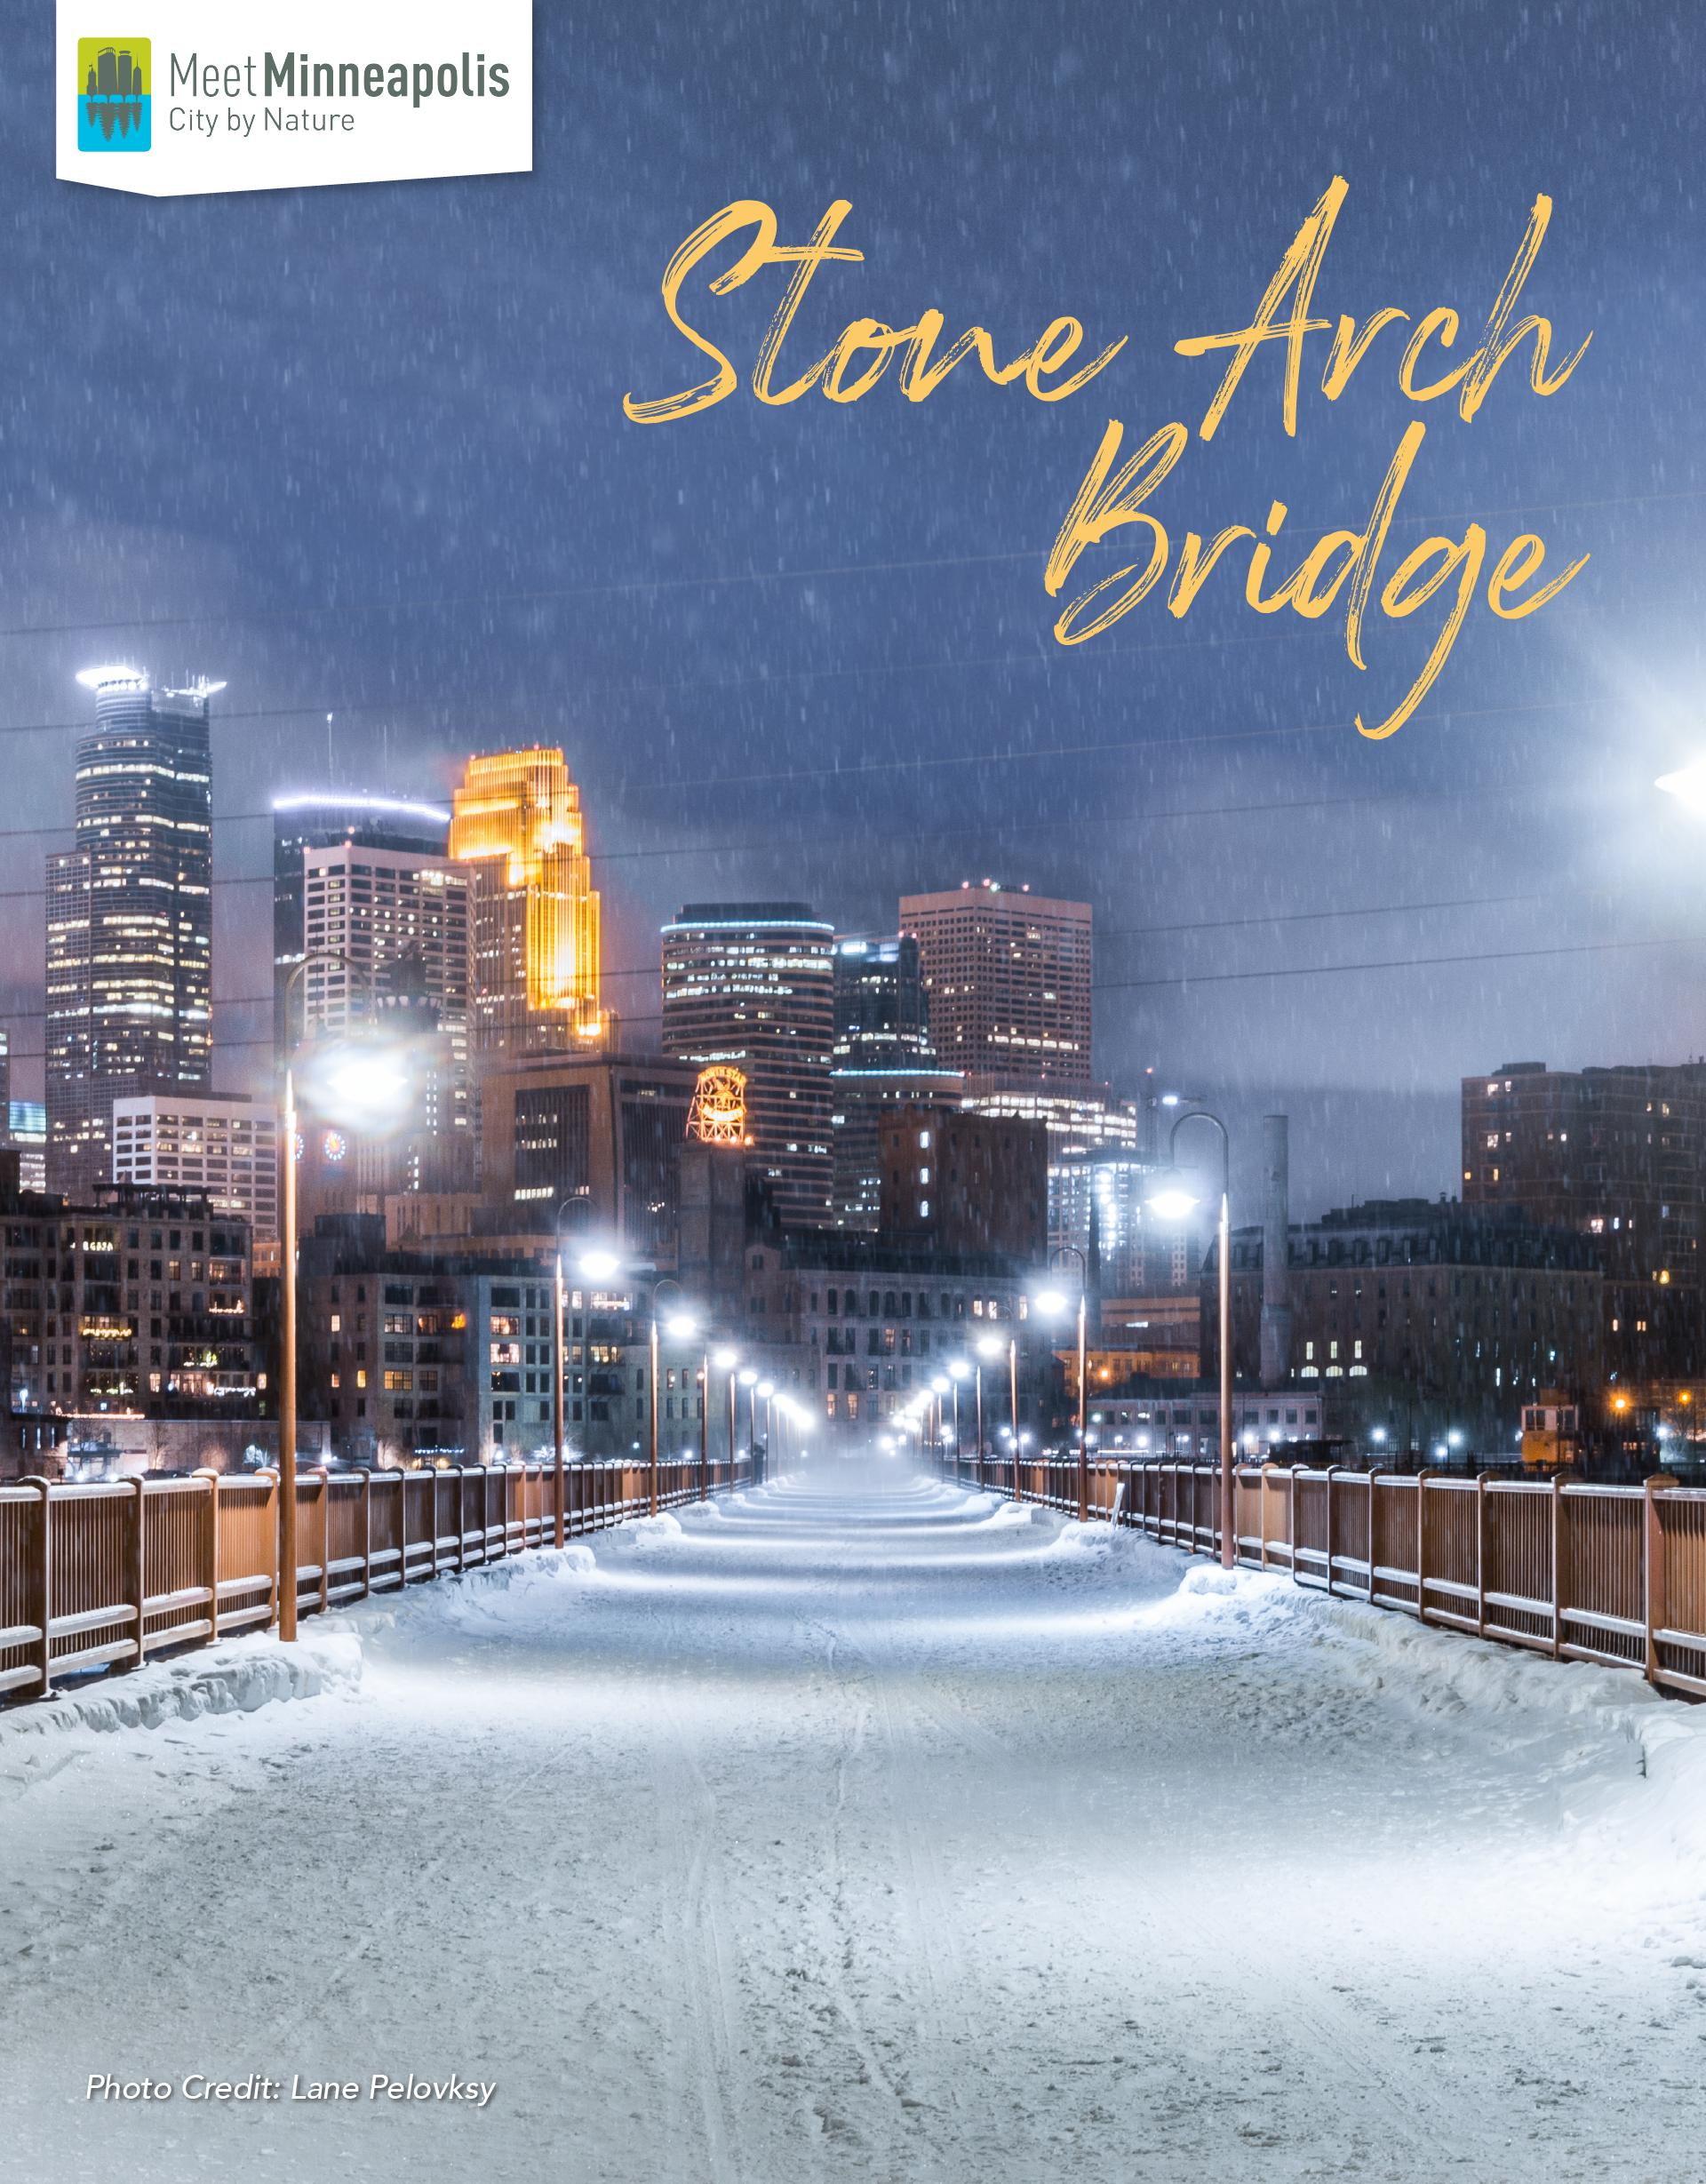 snowy stone arch bridge